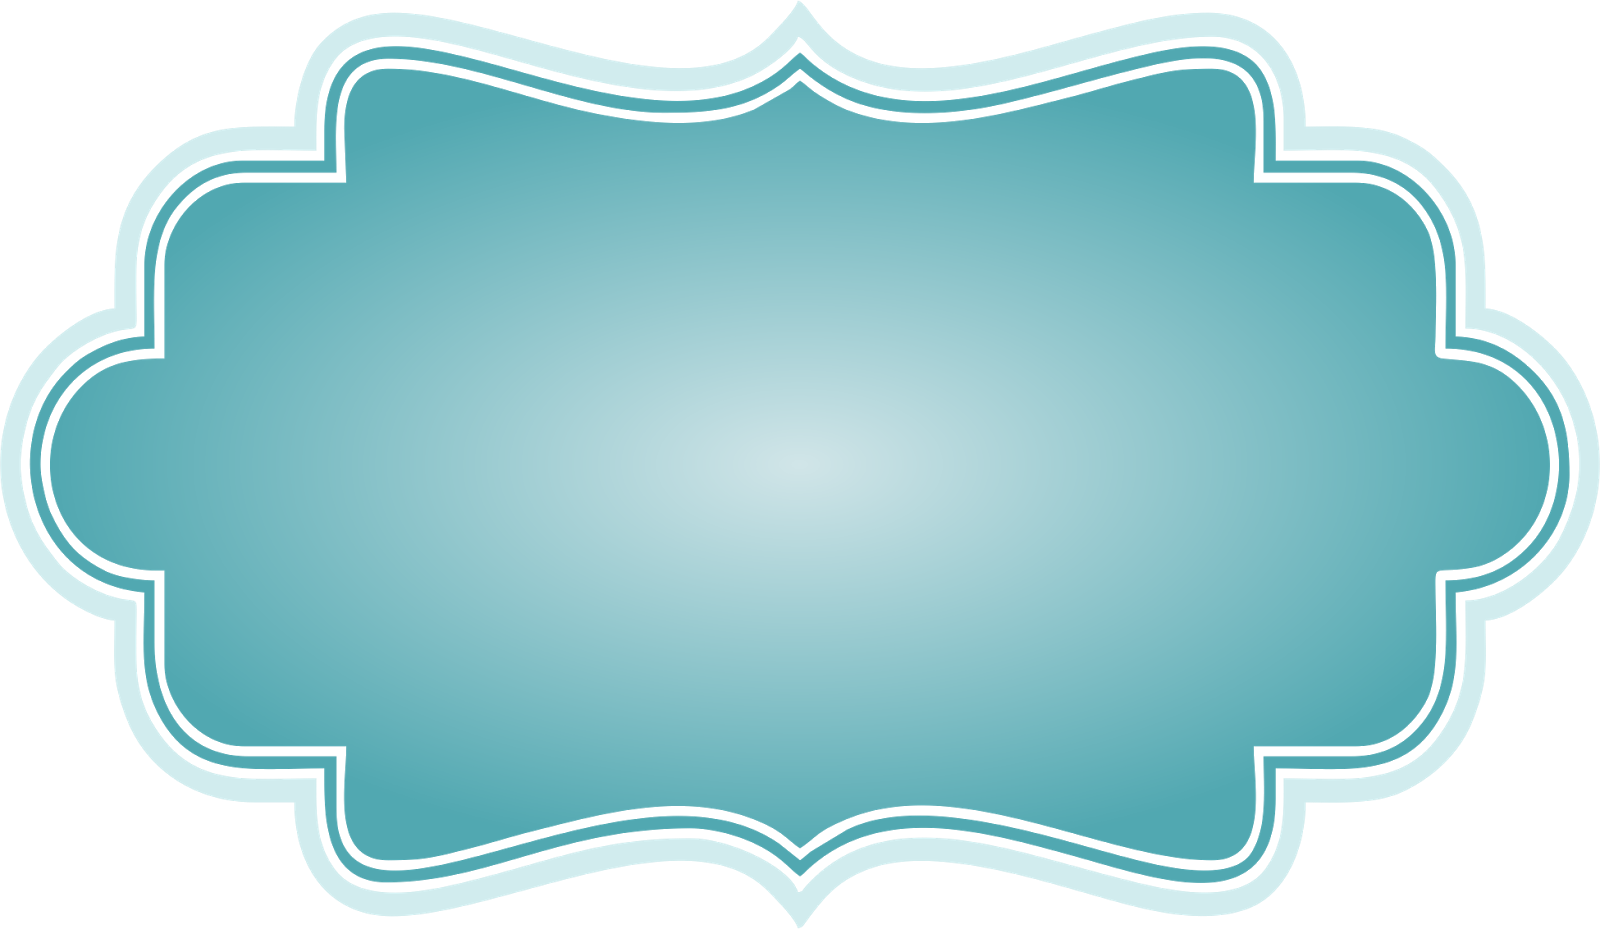 Napkin clipart used. Y png etiquetas pinterest